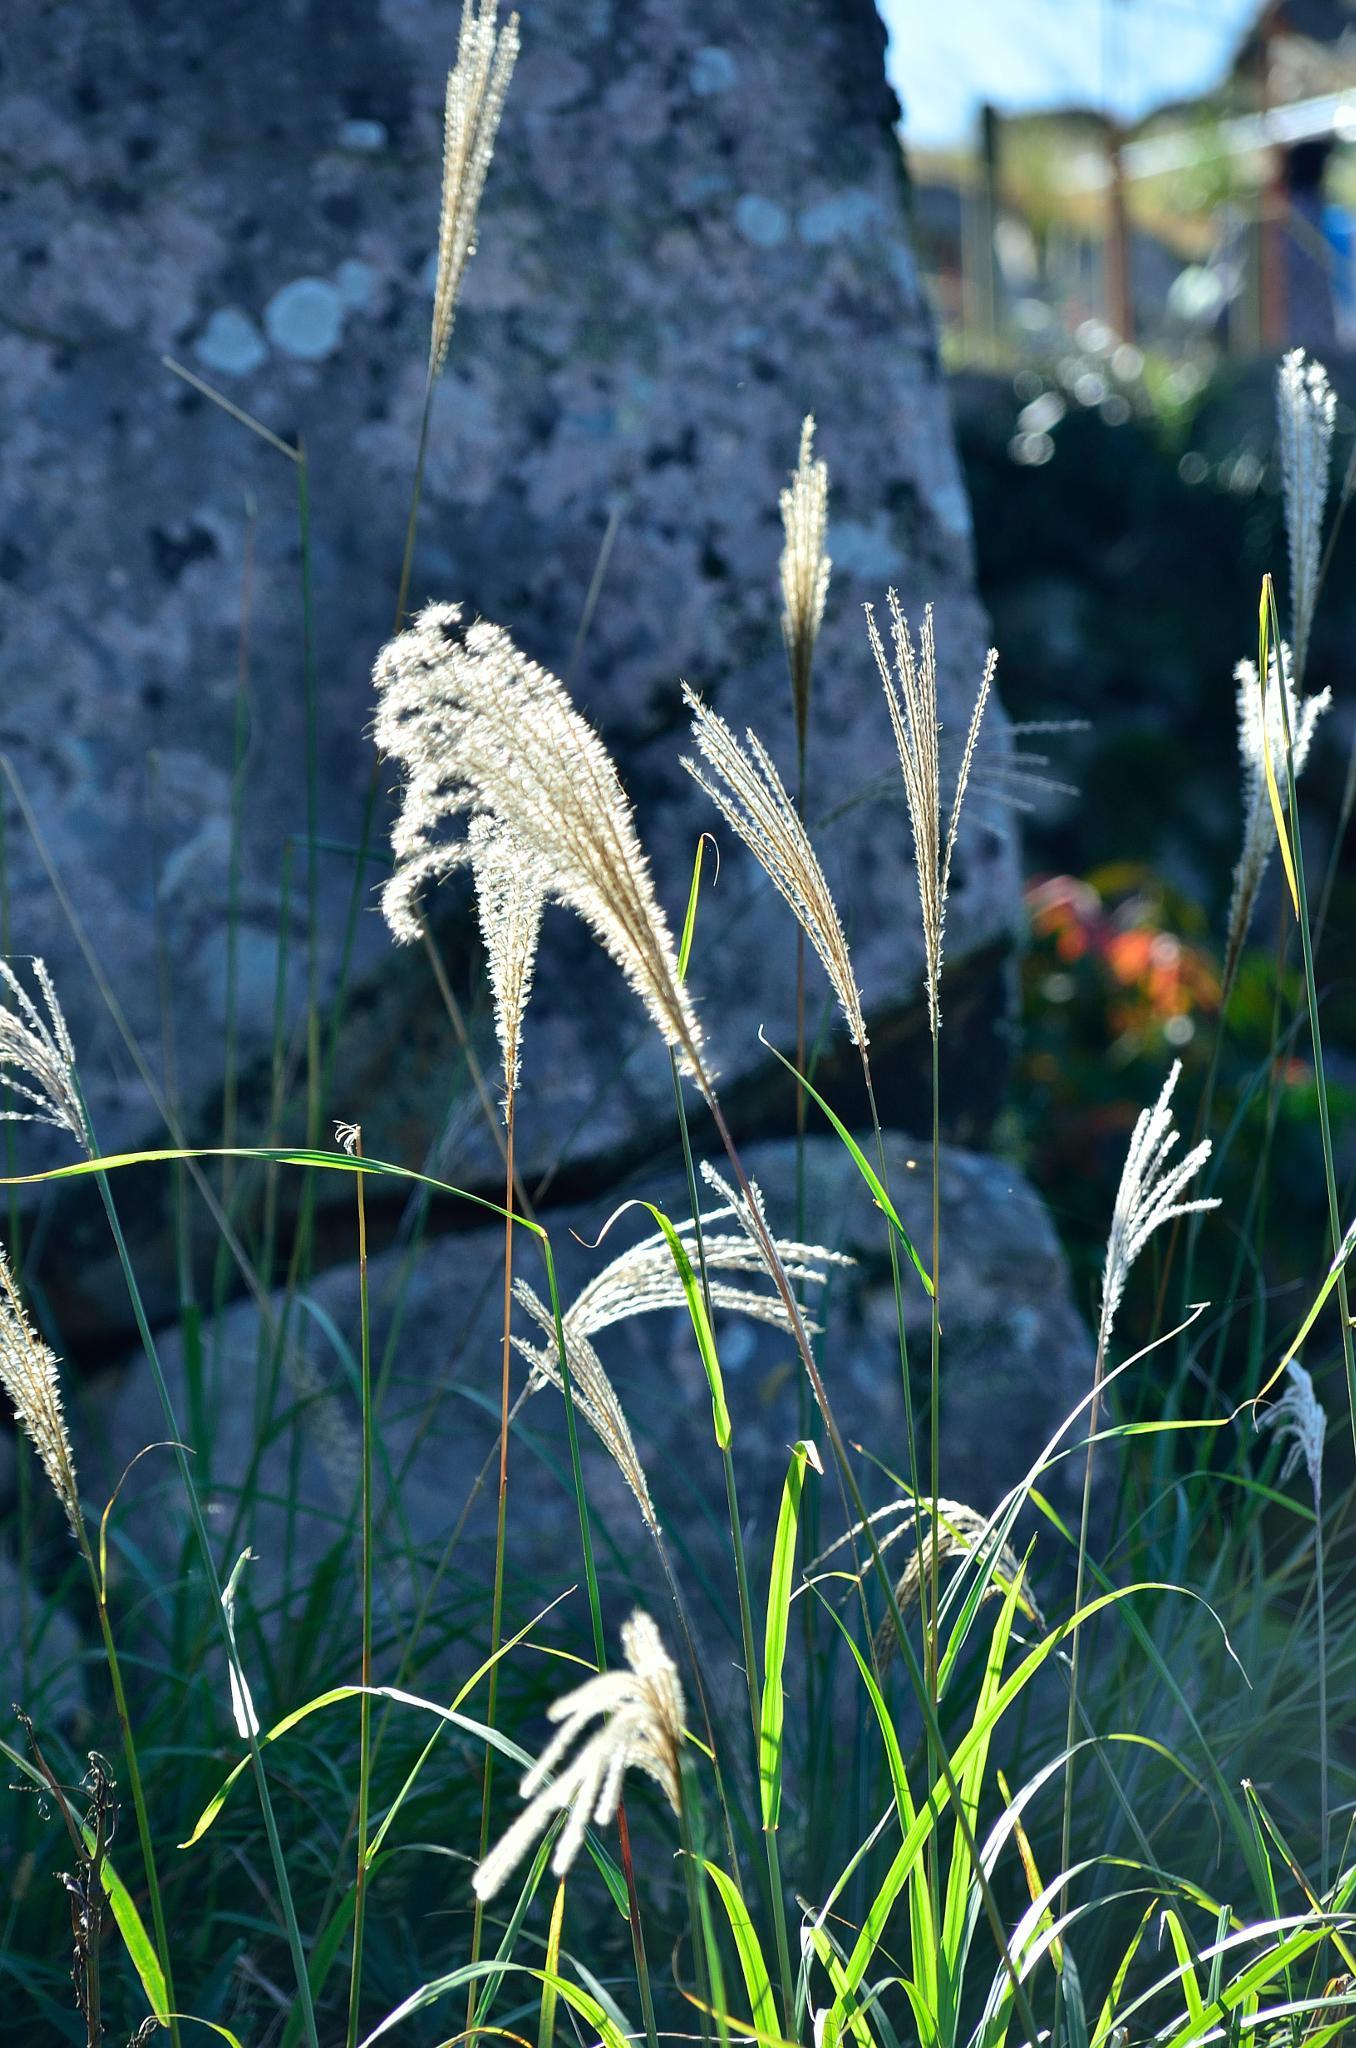 Silver grass with stone wall by Hiroaki Hattori